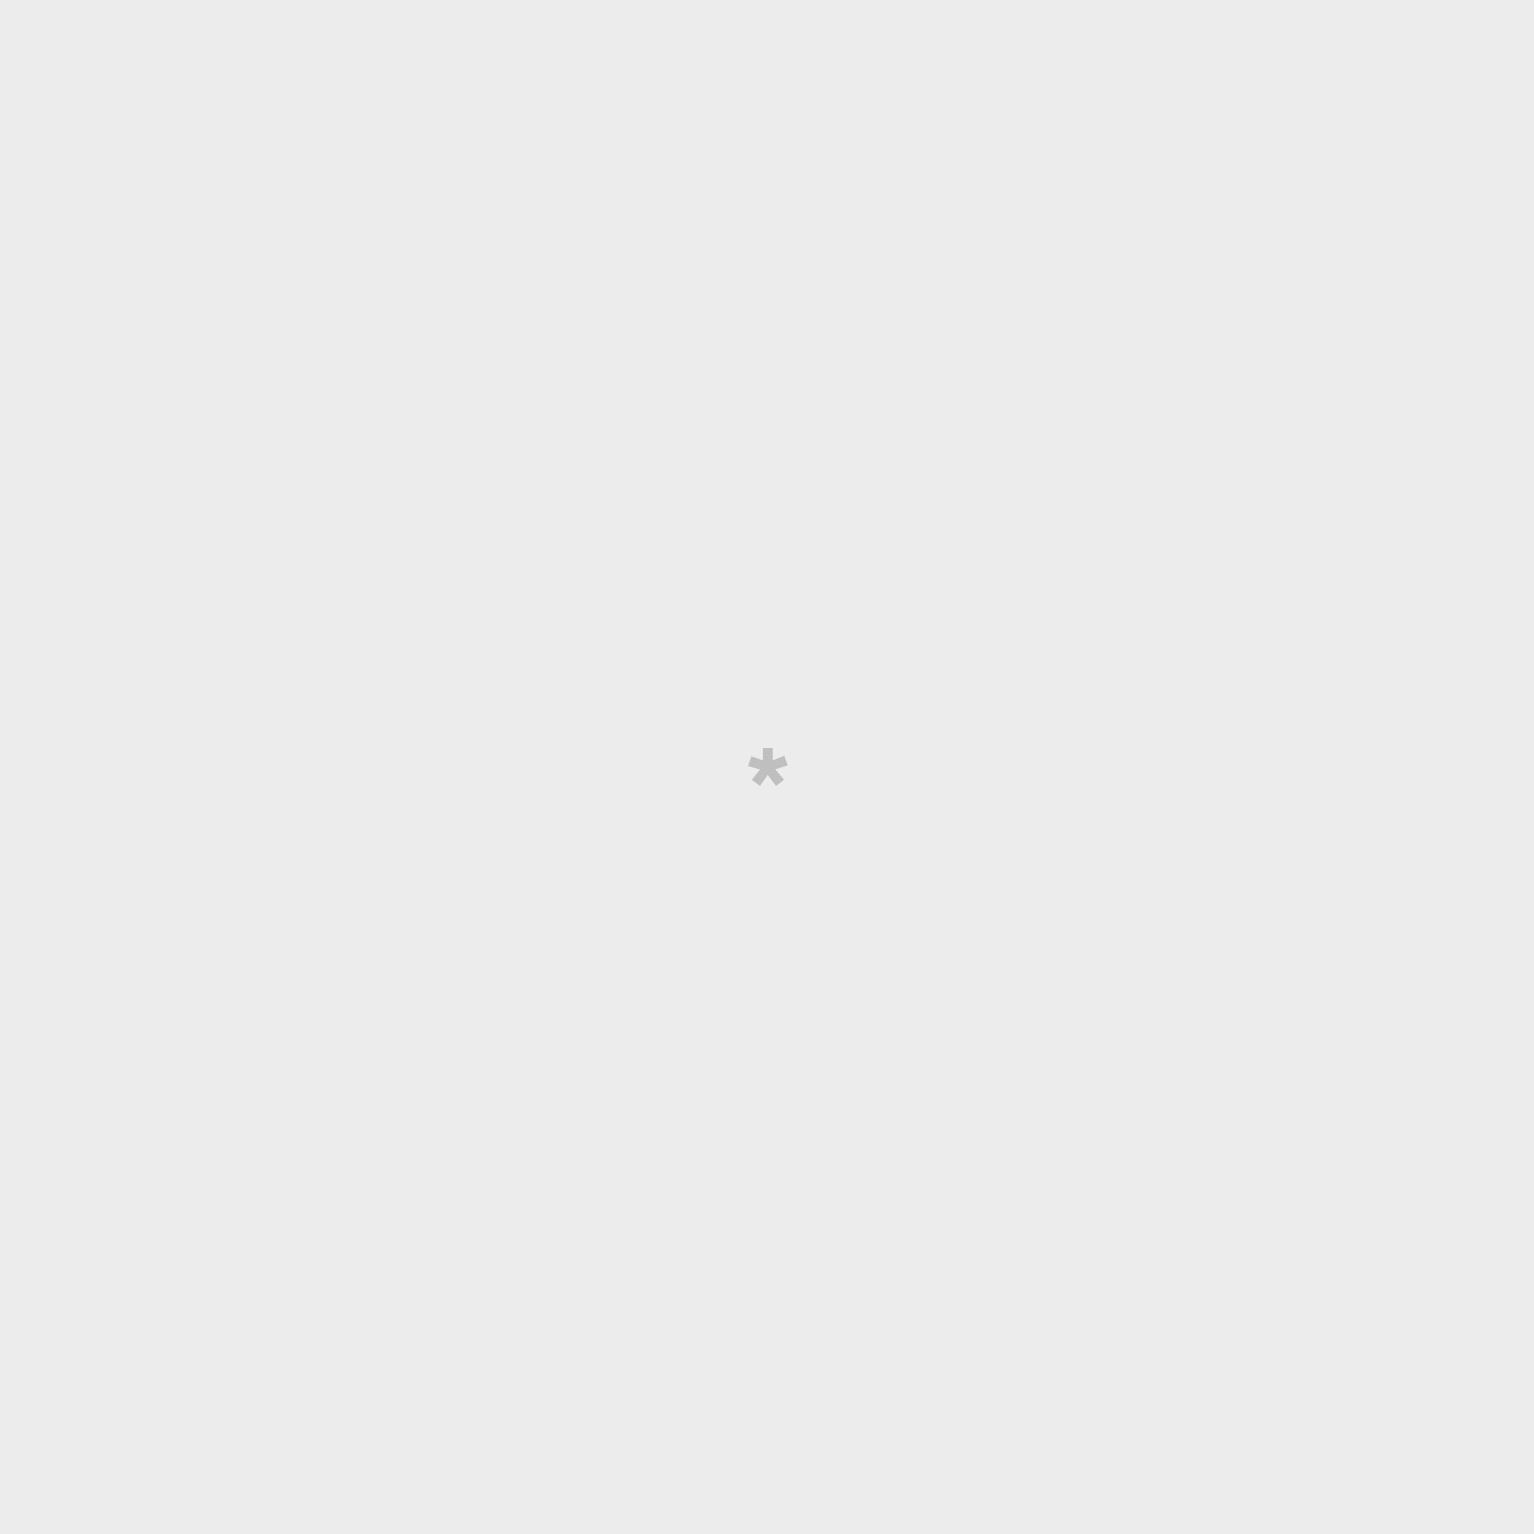 Beach bag - Prepear for summer (ENG)